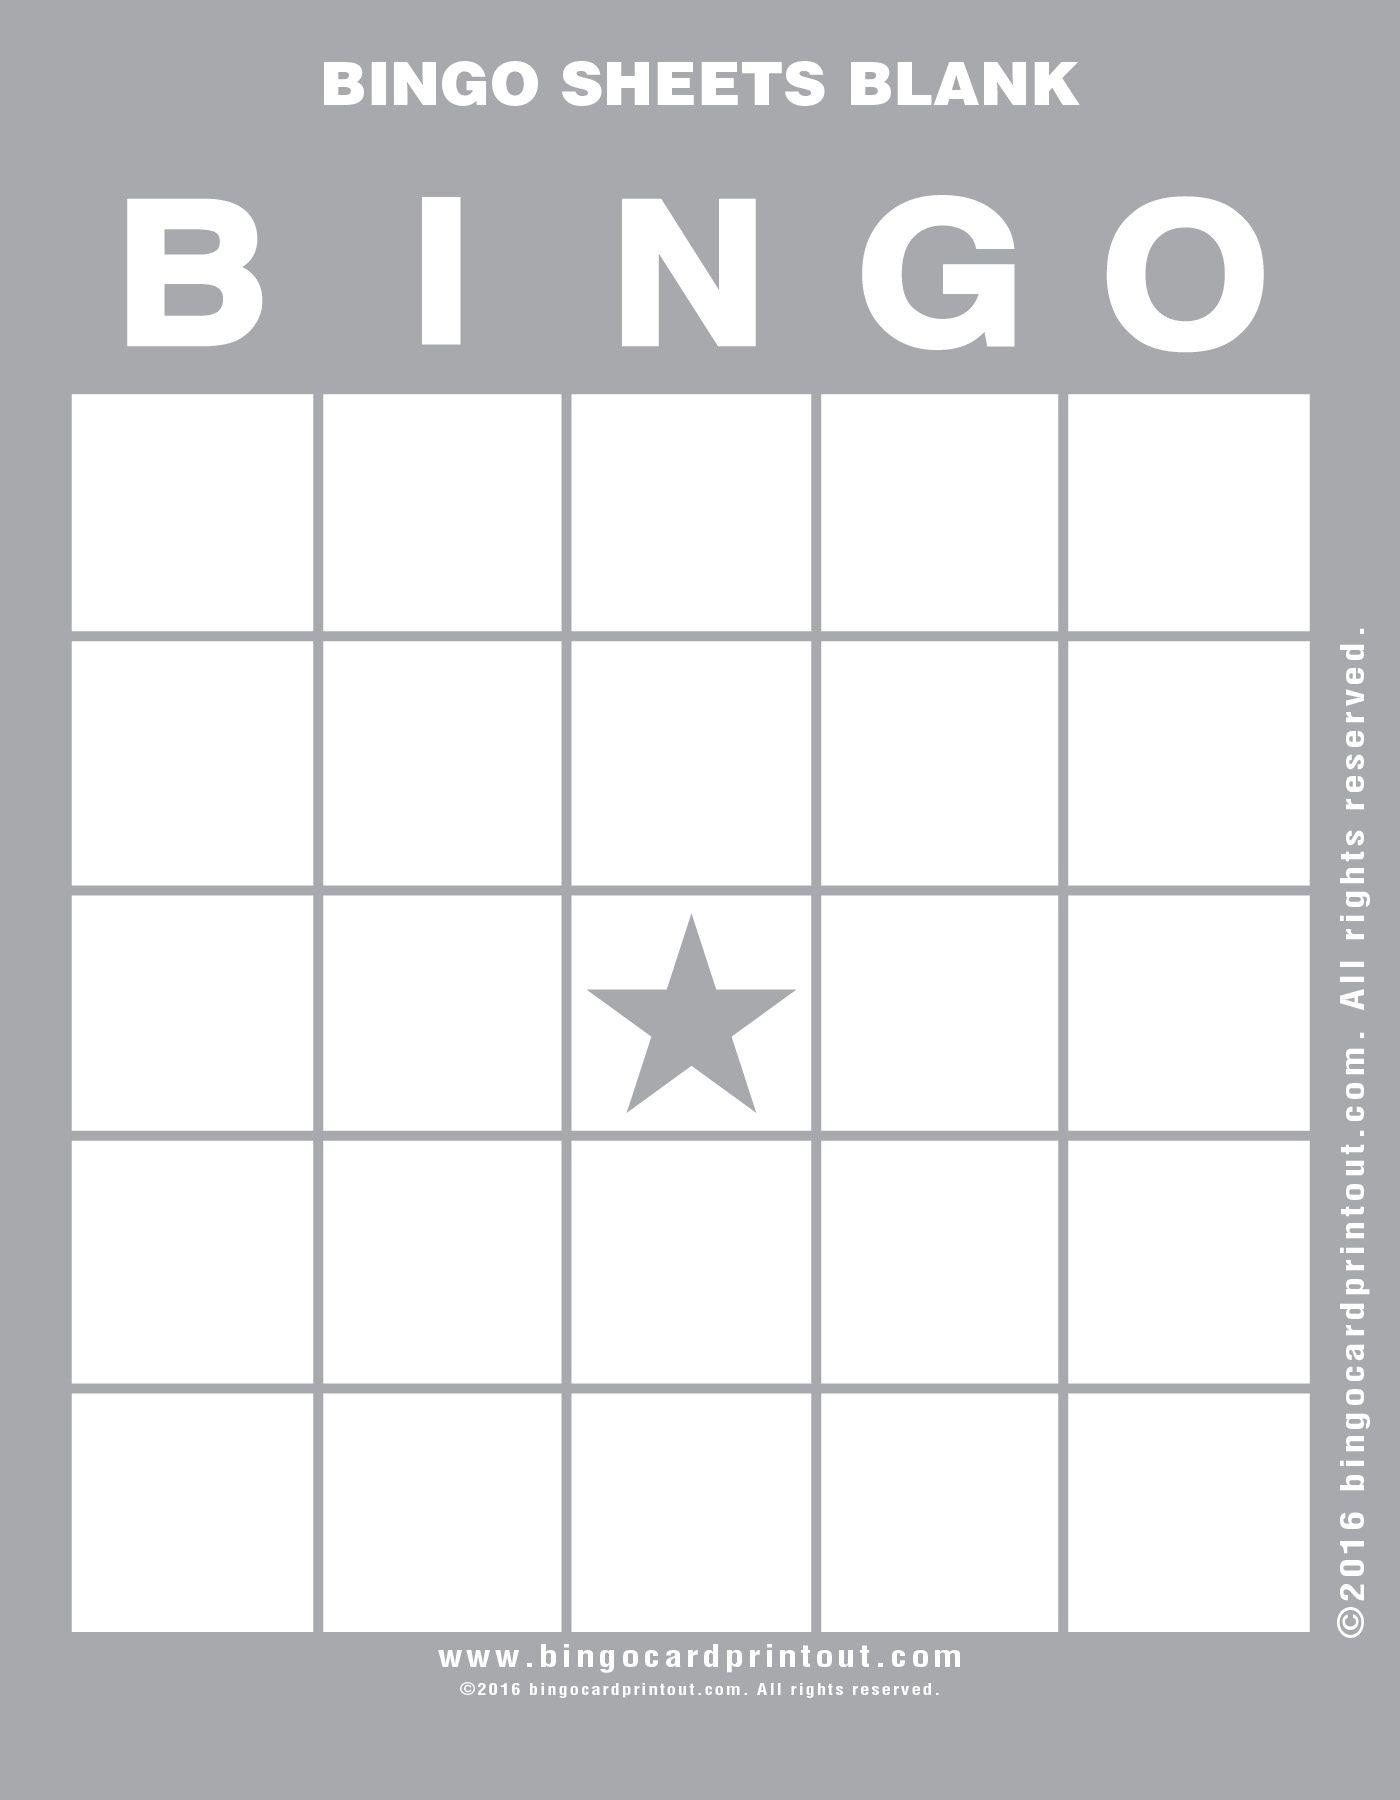 Bingo Sheets Blank | Bingo Sheets, Bingo Cards, Blank Bingo